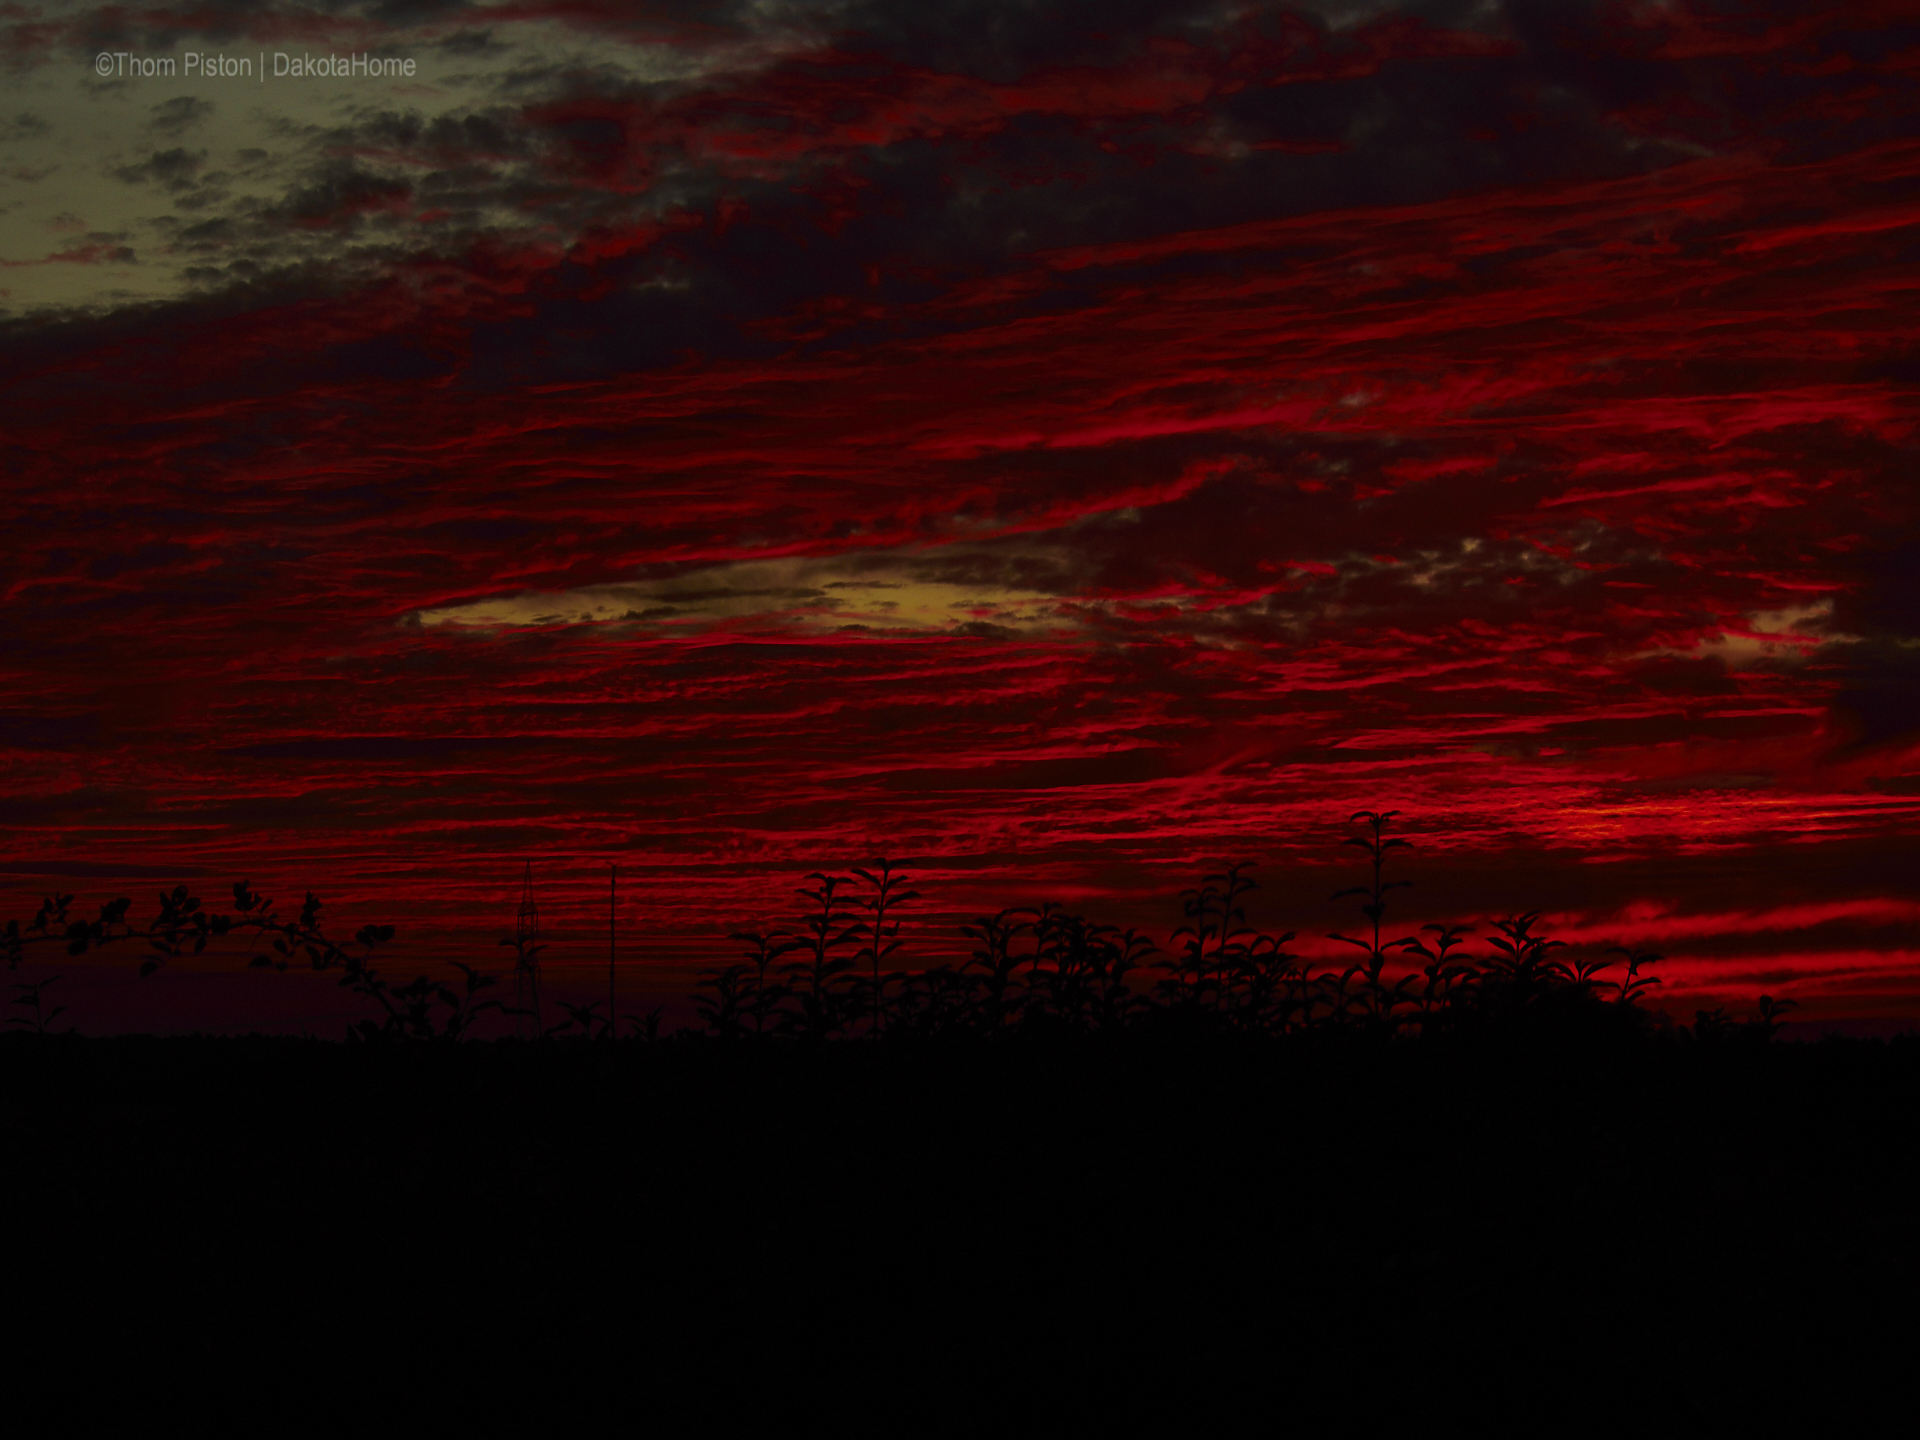 Sonnenuntergang, Dakota Home, Mitte Oktober 2018